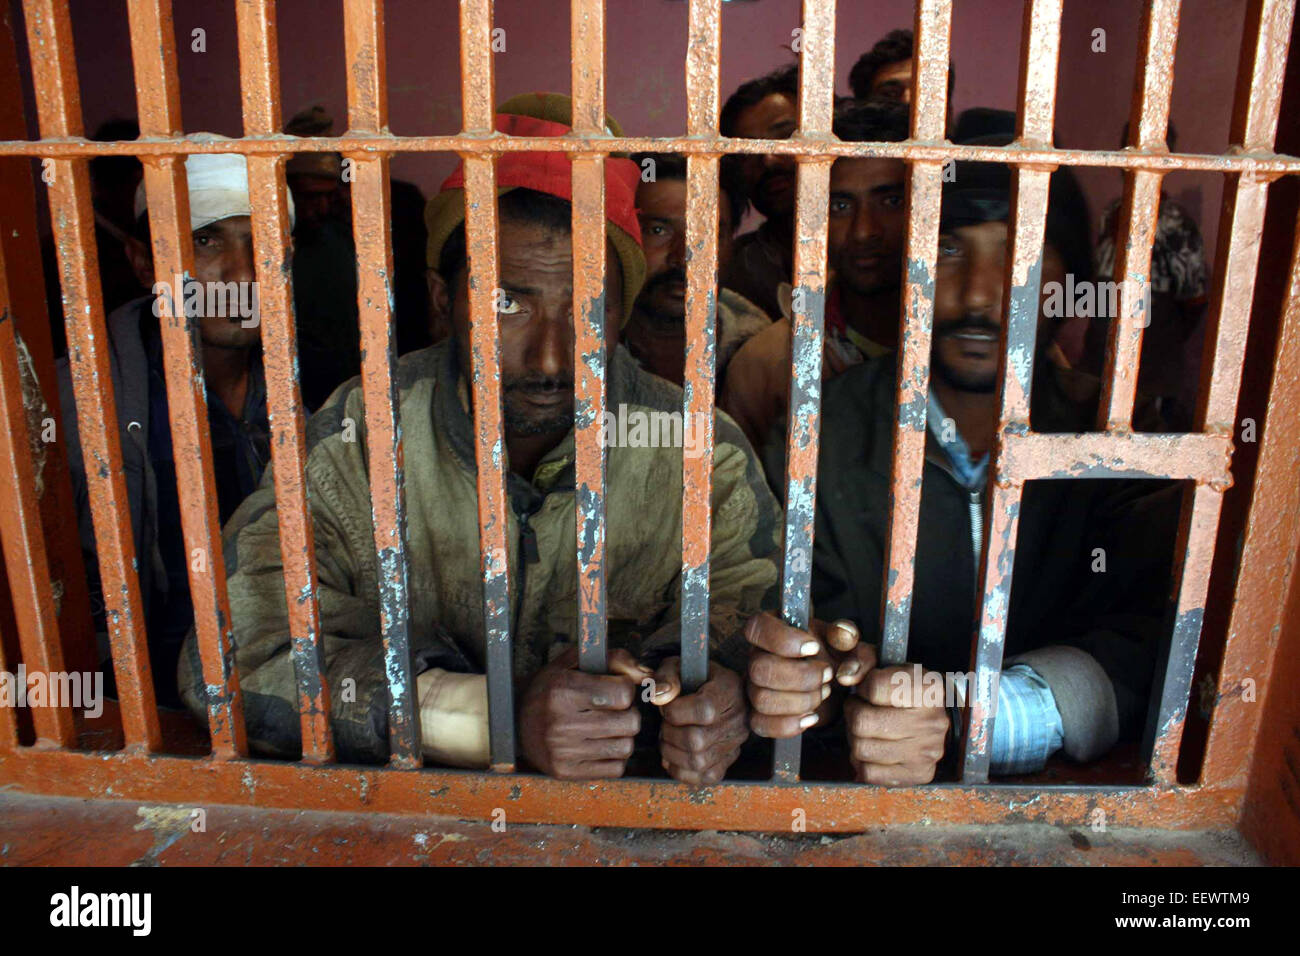 Karachi. 22nd Jan, 2015. Arrested Indian fishermen stand in a police lockup in southern Pakistani port city of Karachi, - Stock Image